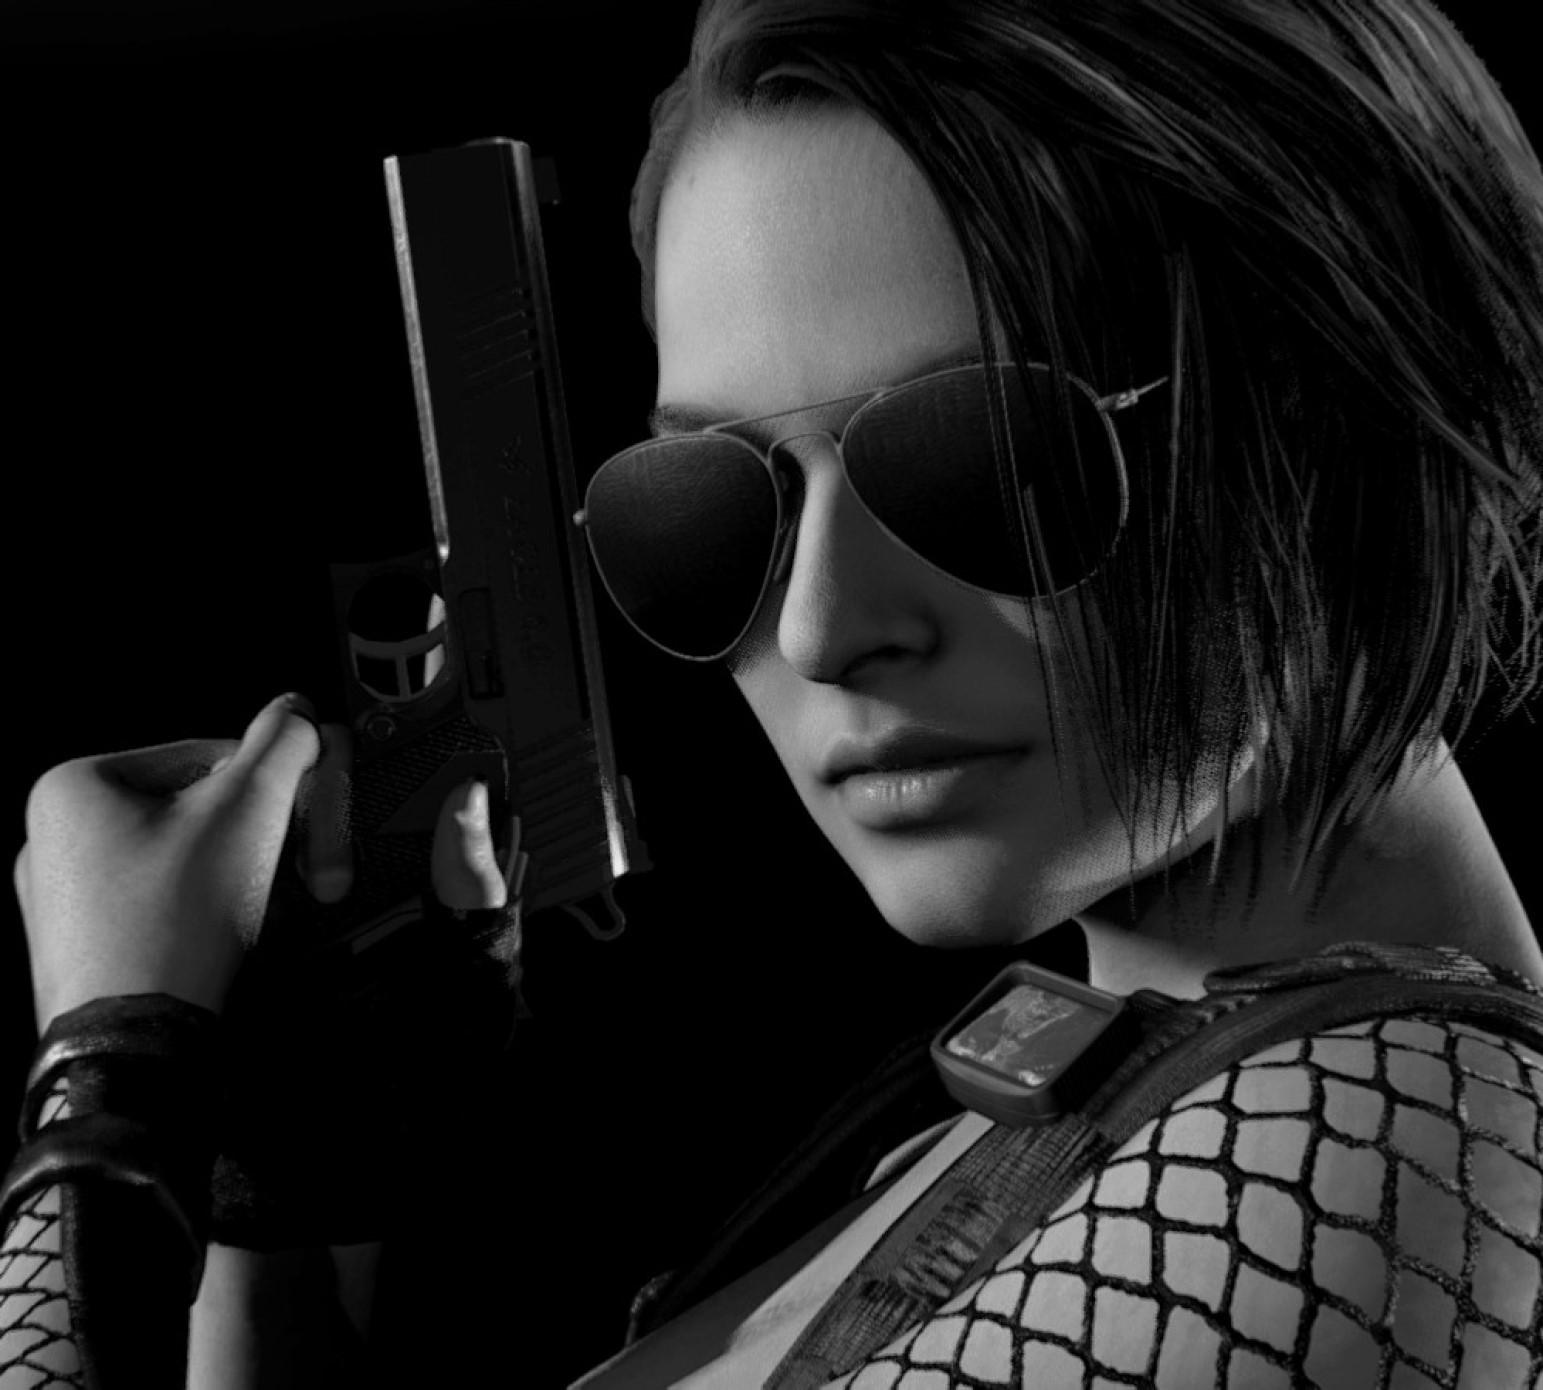 952060_screenshots_20200420205744_1.jpg - Resident Evil 3: Nemesis